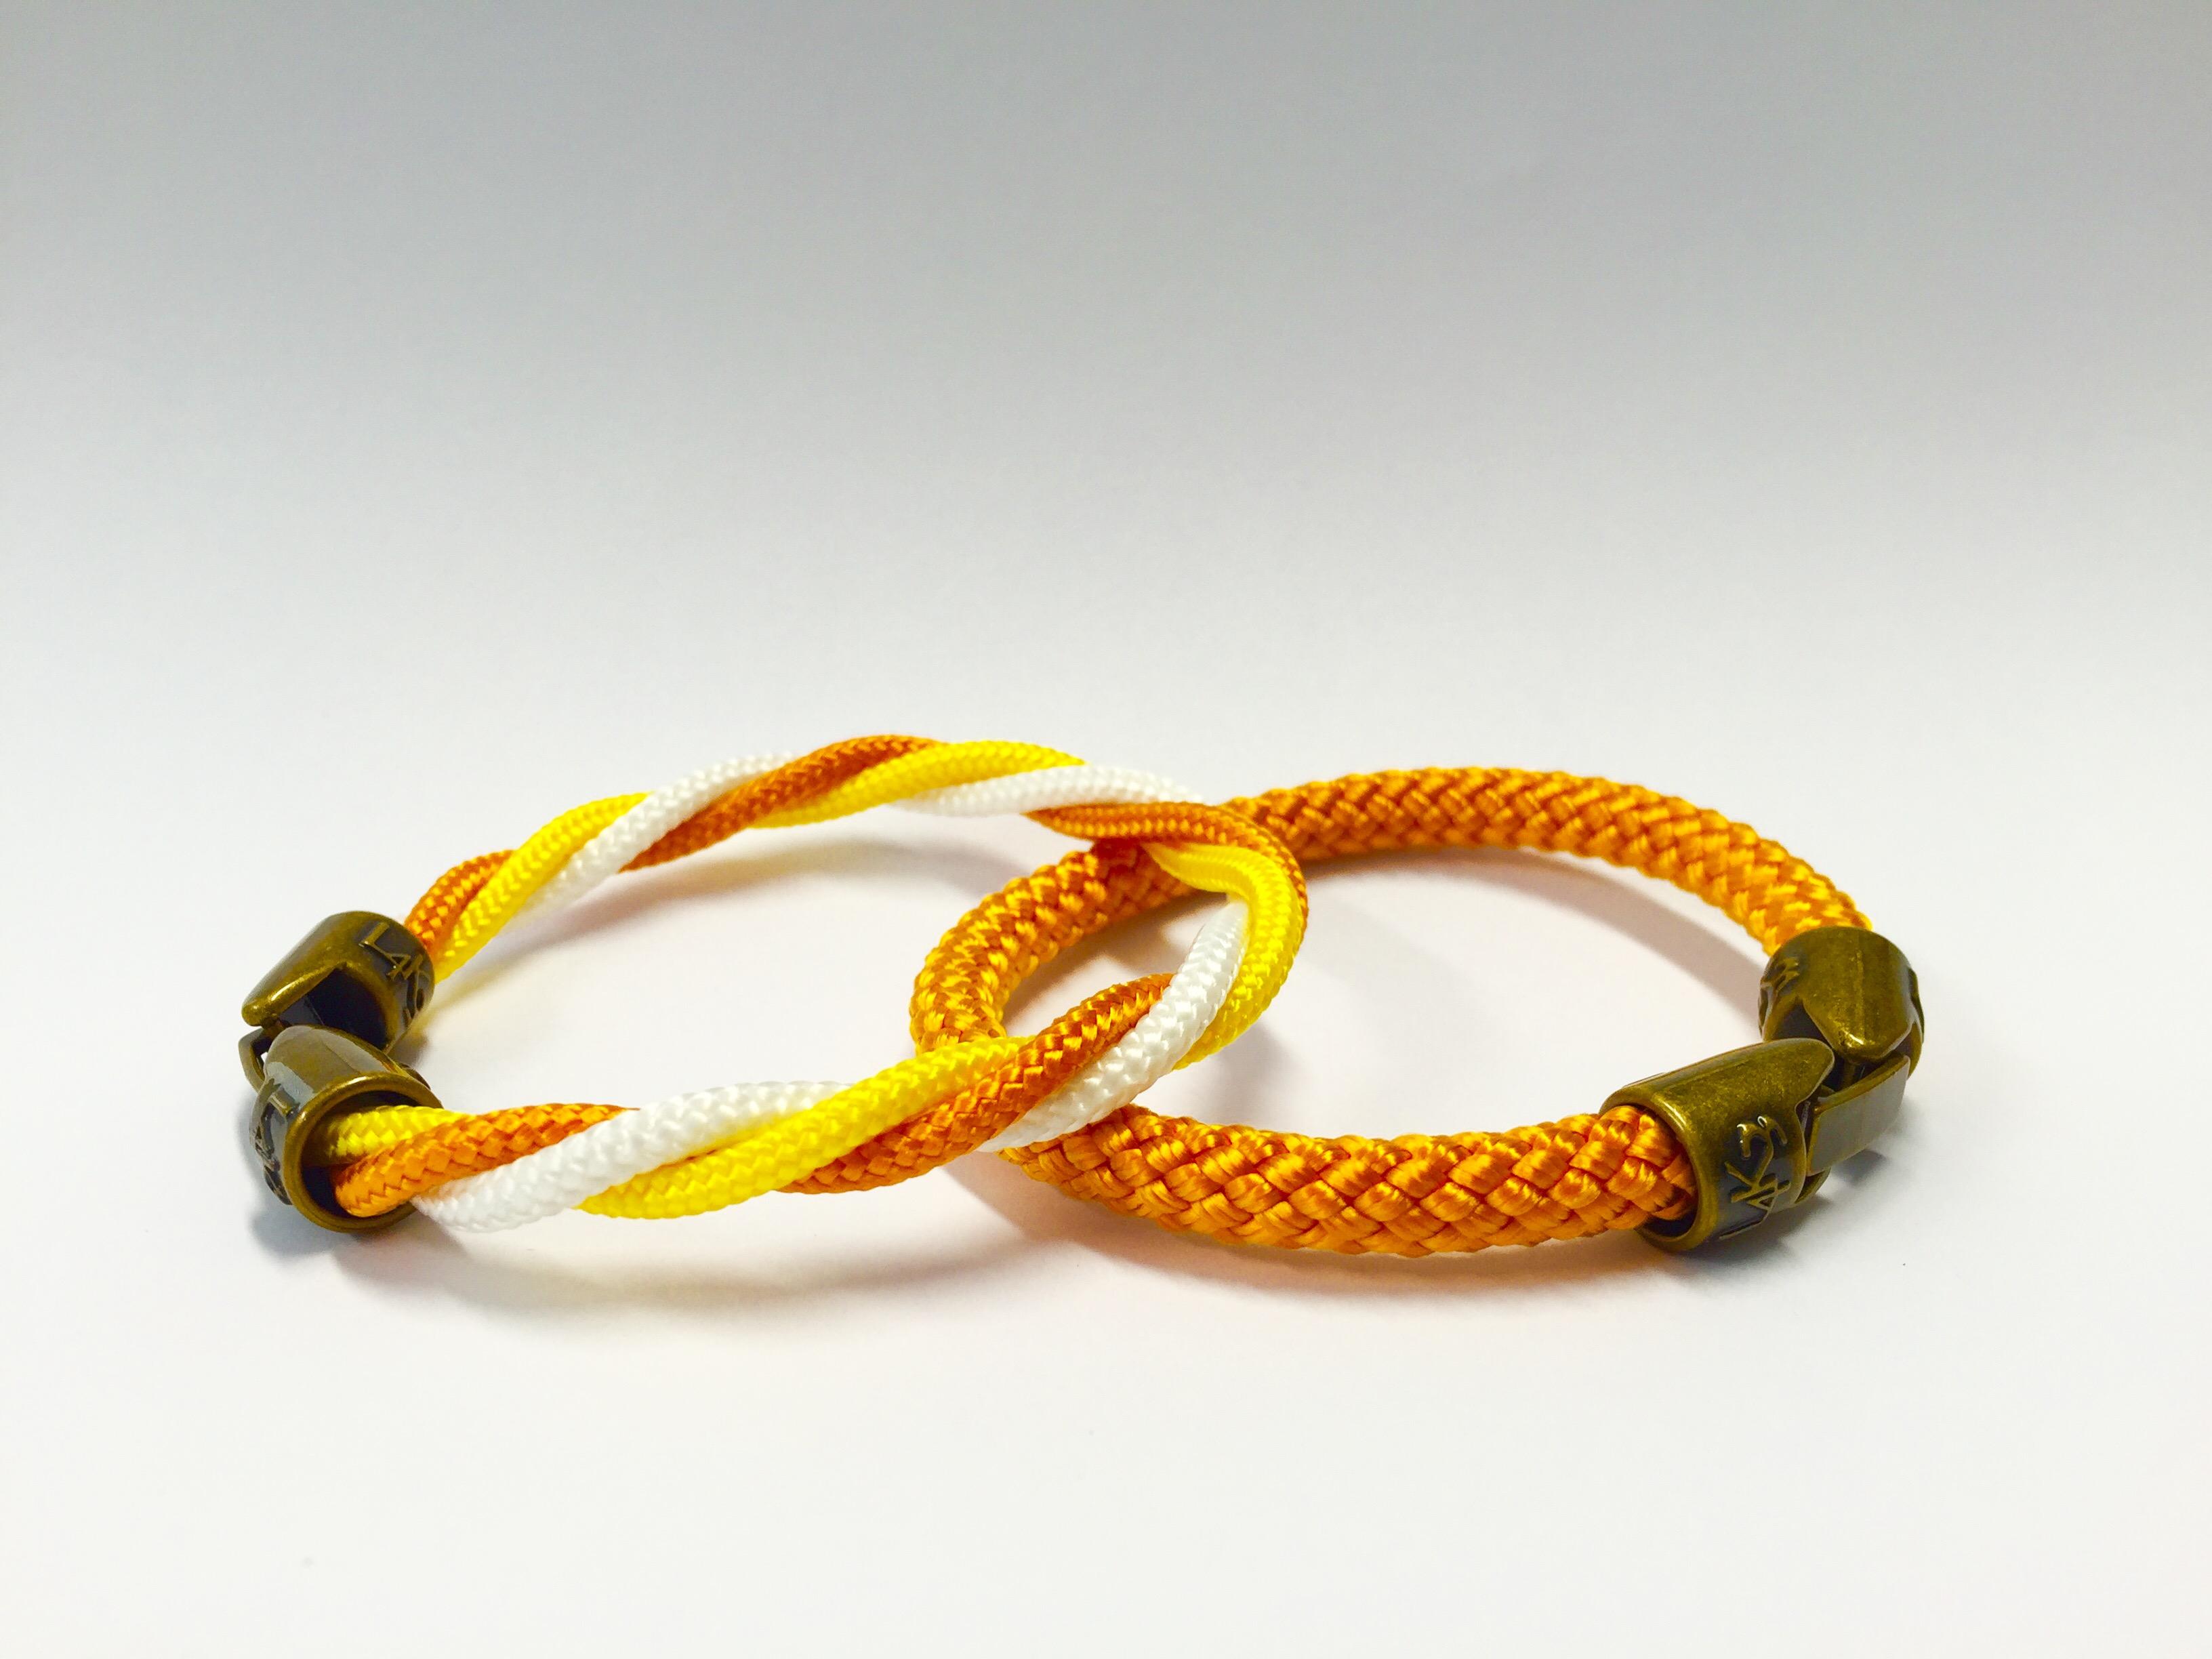 Souvenir dal lago d'Iseo: il braccialetto di The Floating Piers